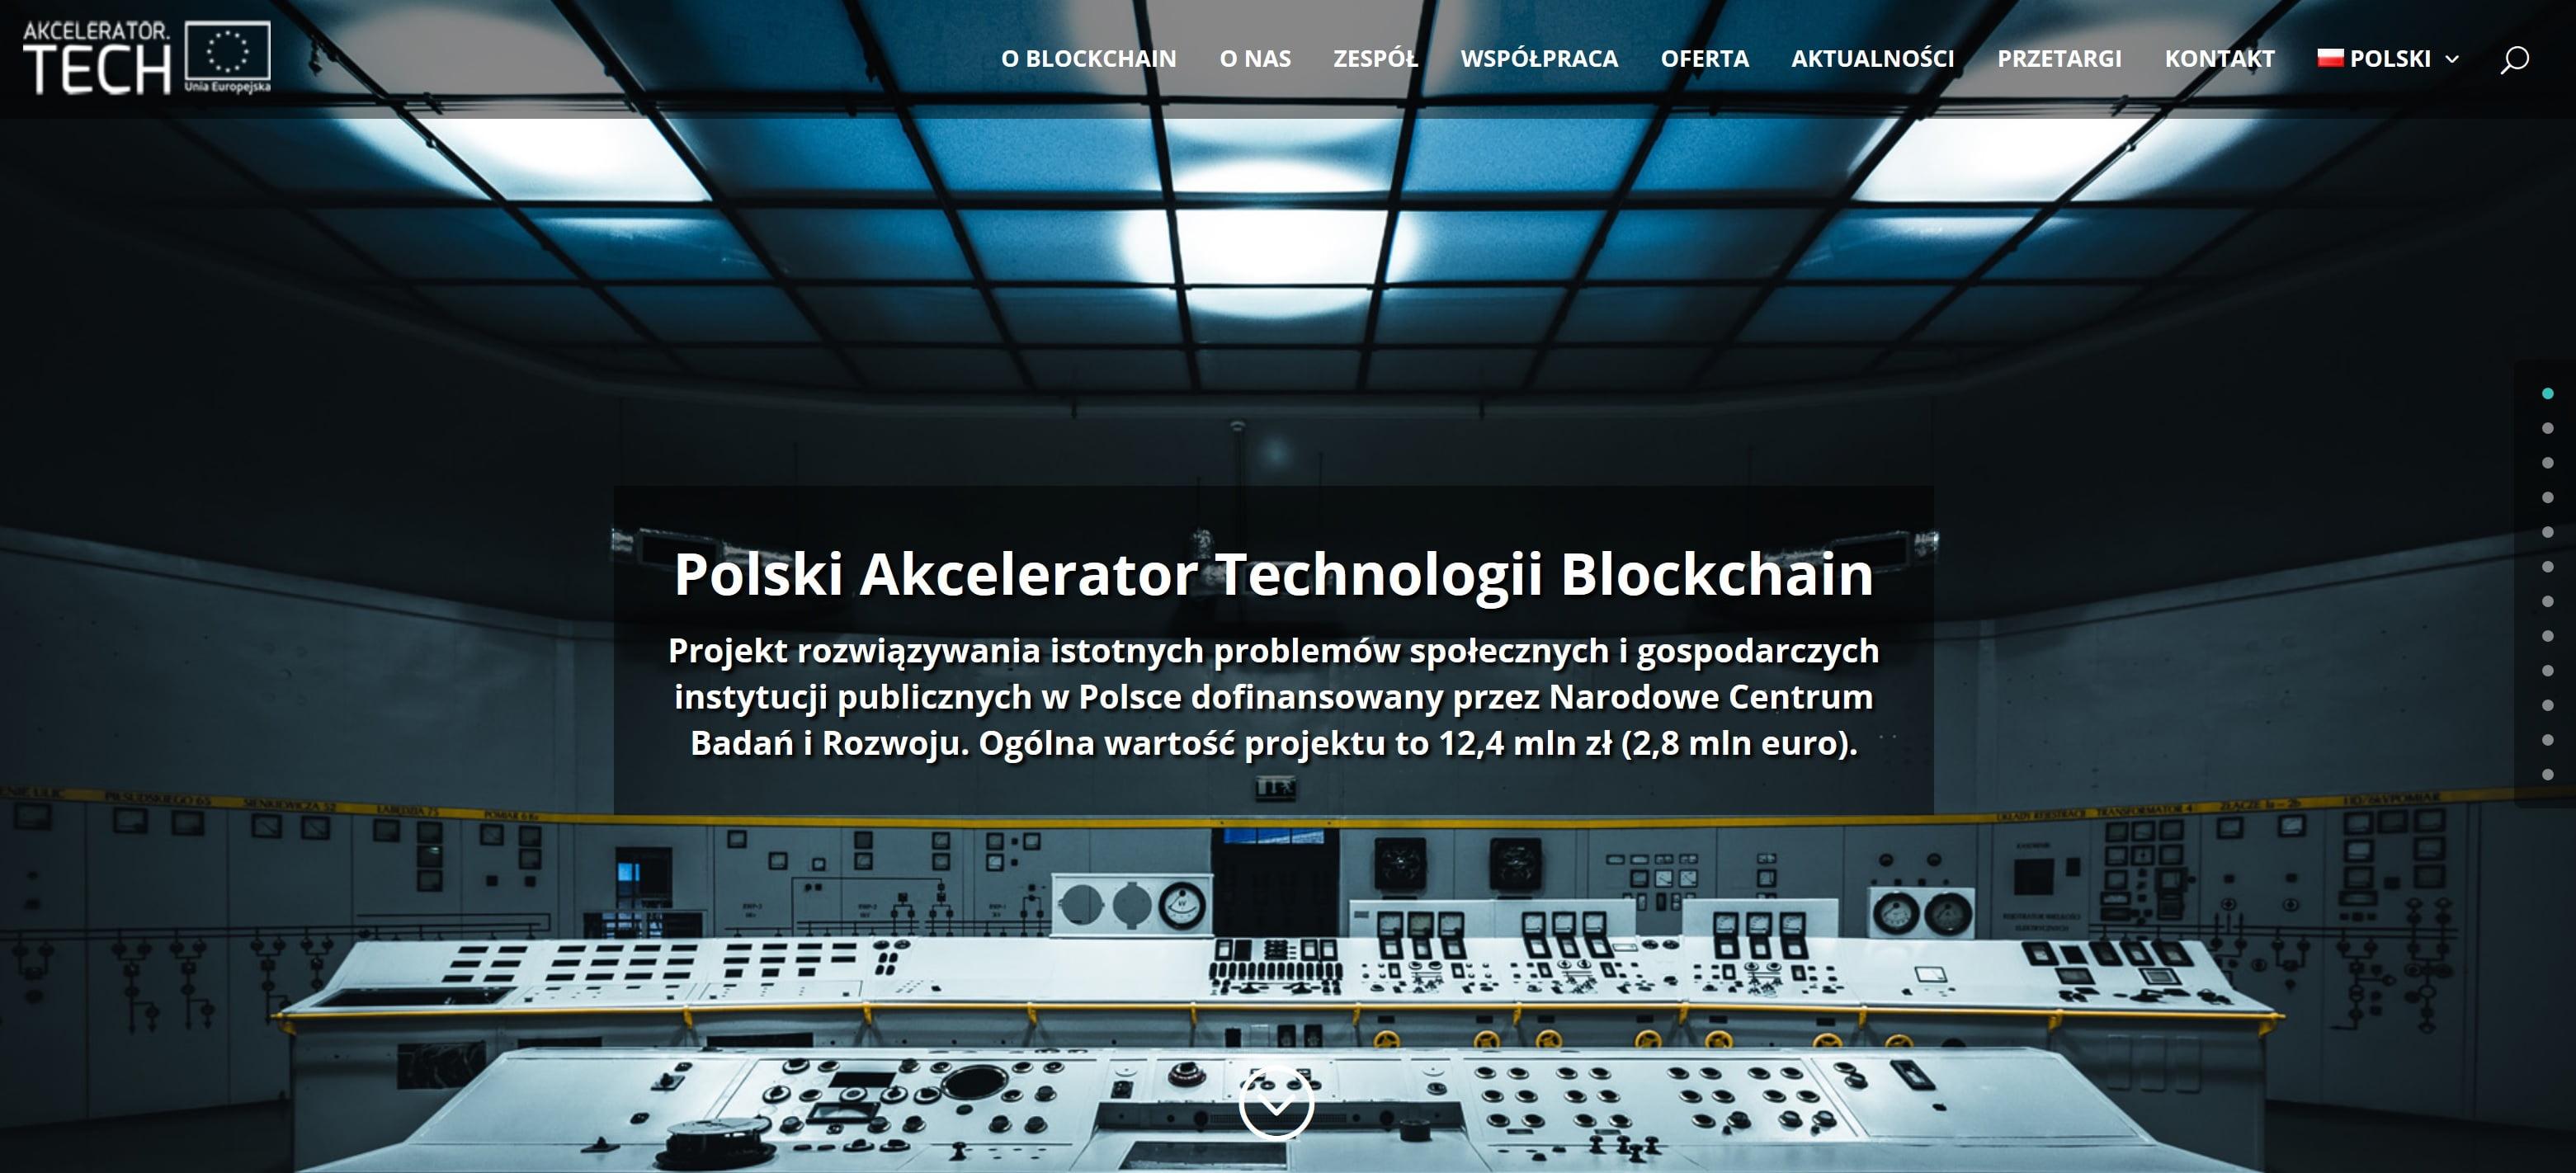 Polski Akcelerator Technologii Blockchain